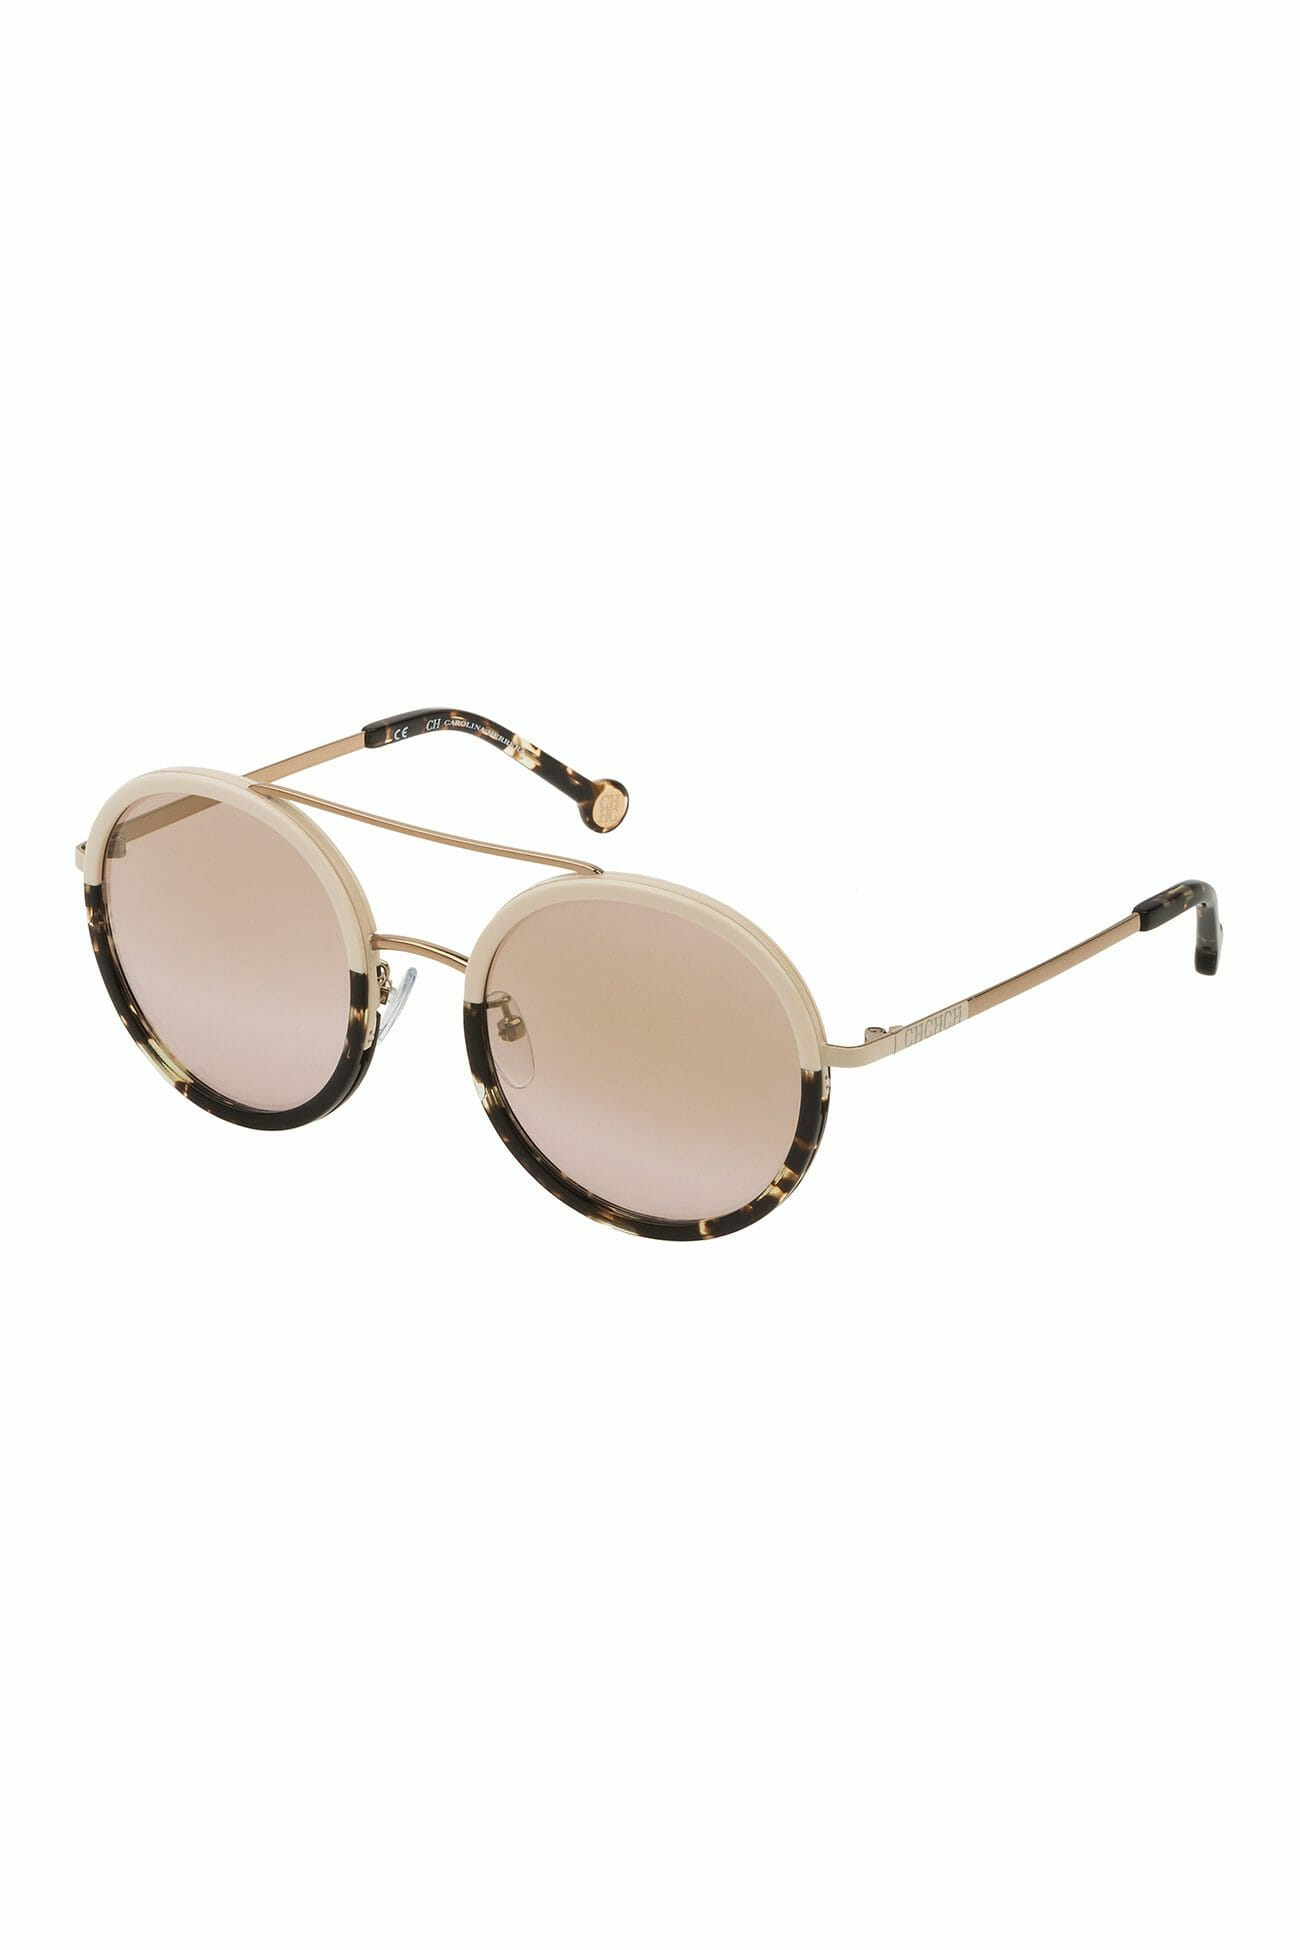 CH-Carolina-Herrera-Eyewear-Women